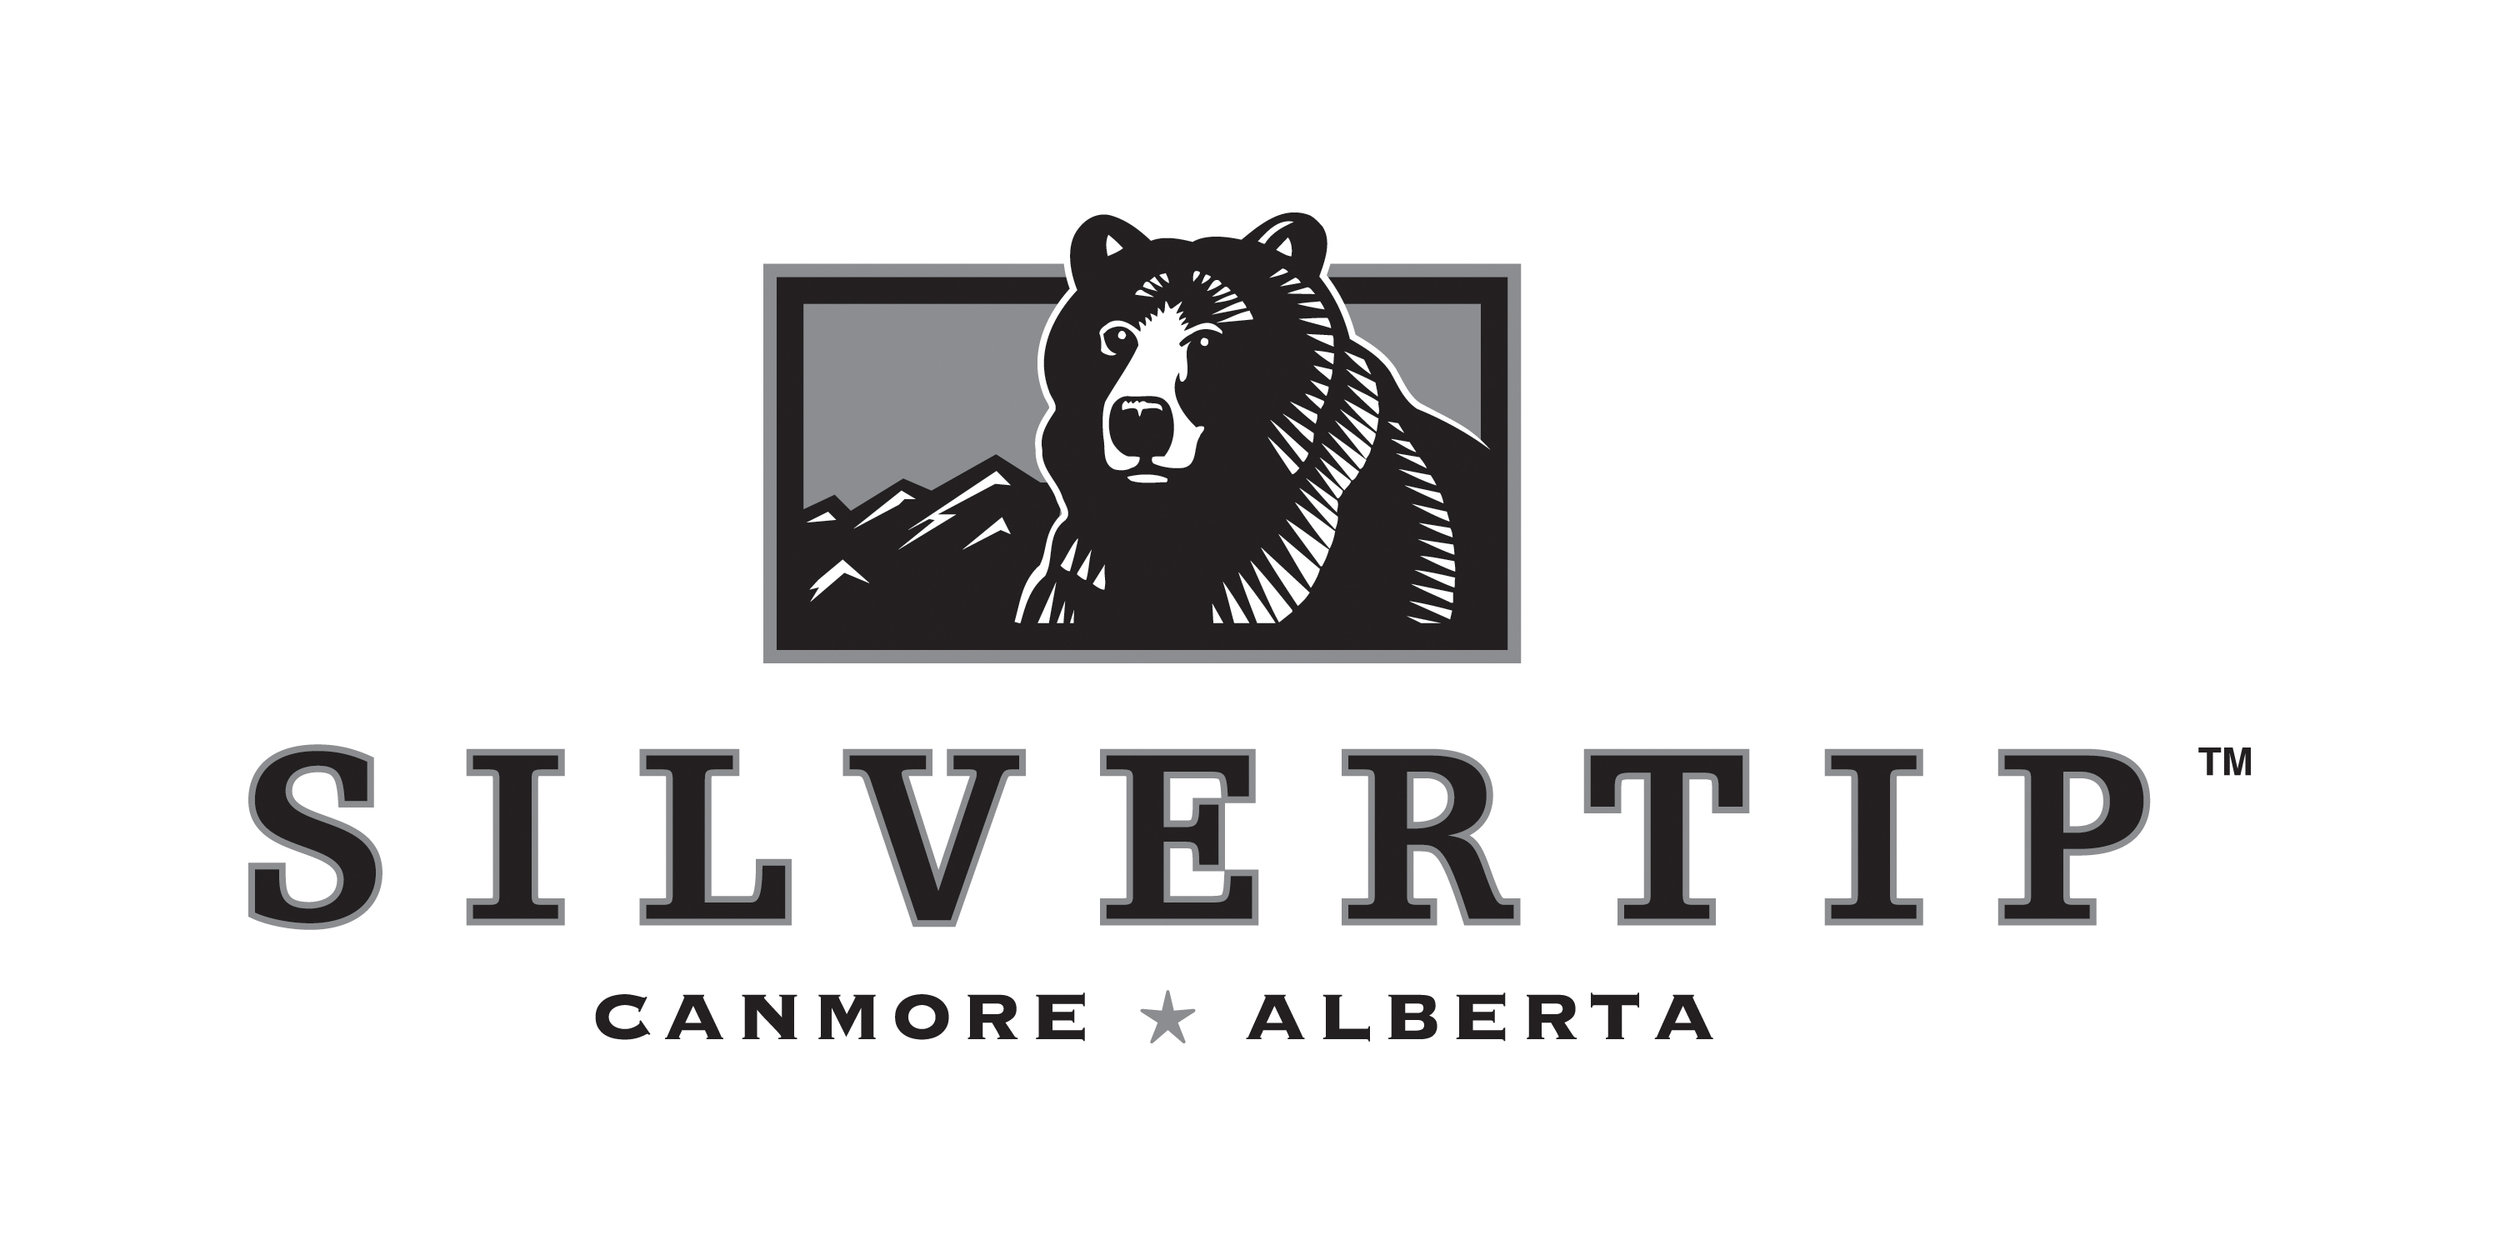 Silvertip Logo with grey background-2014-DW.jpg